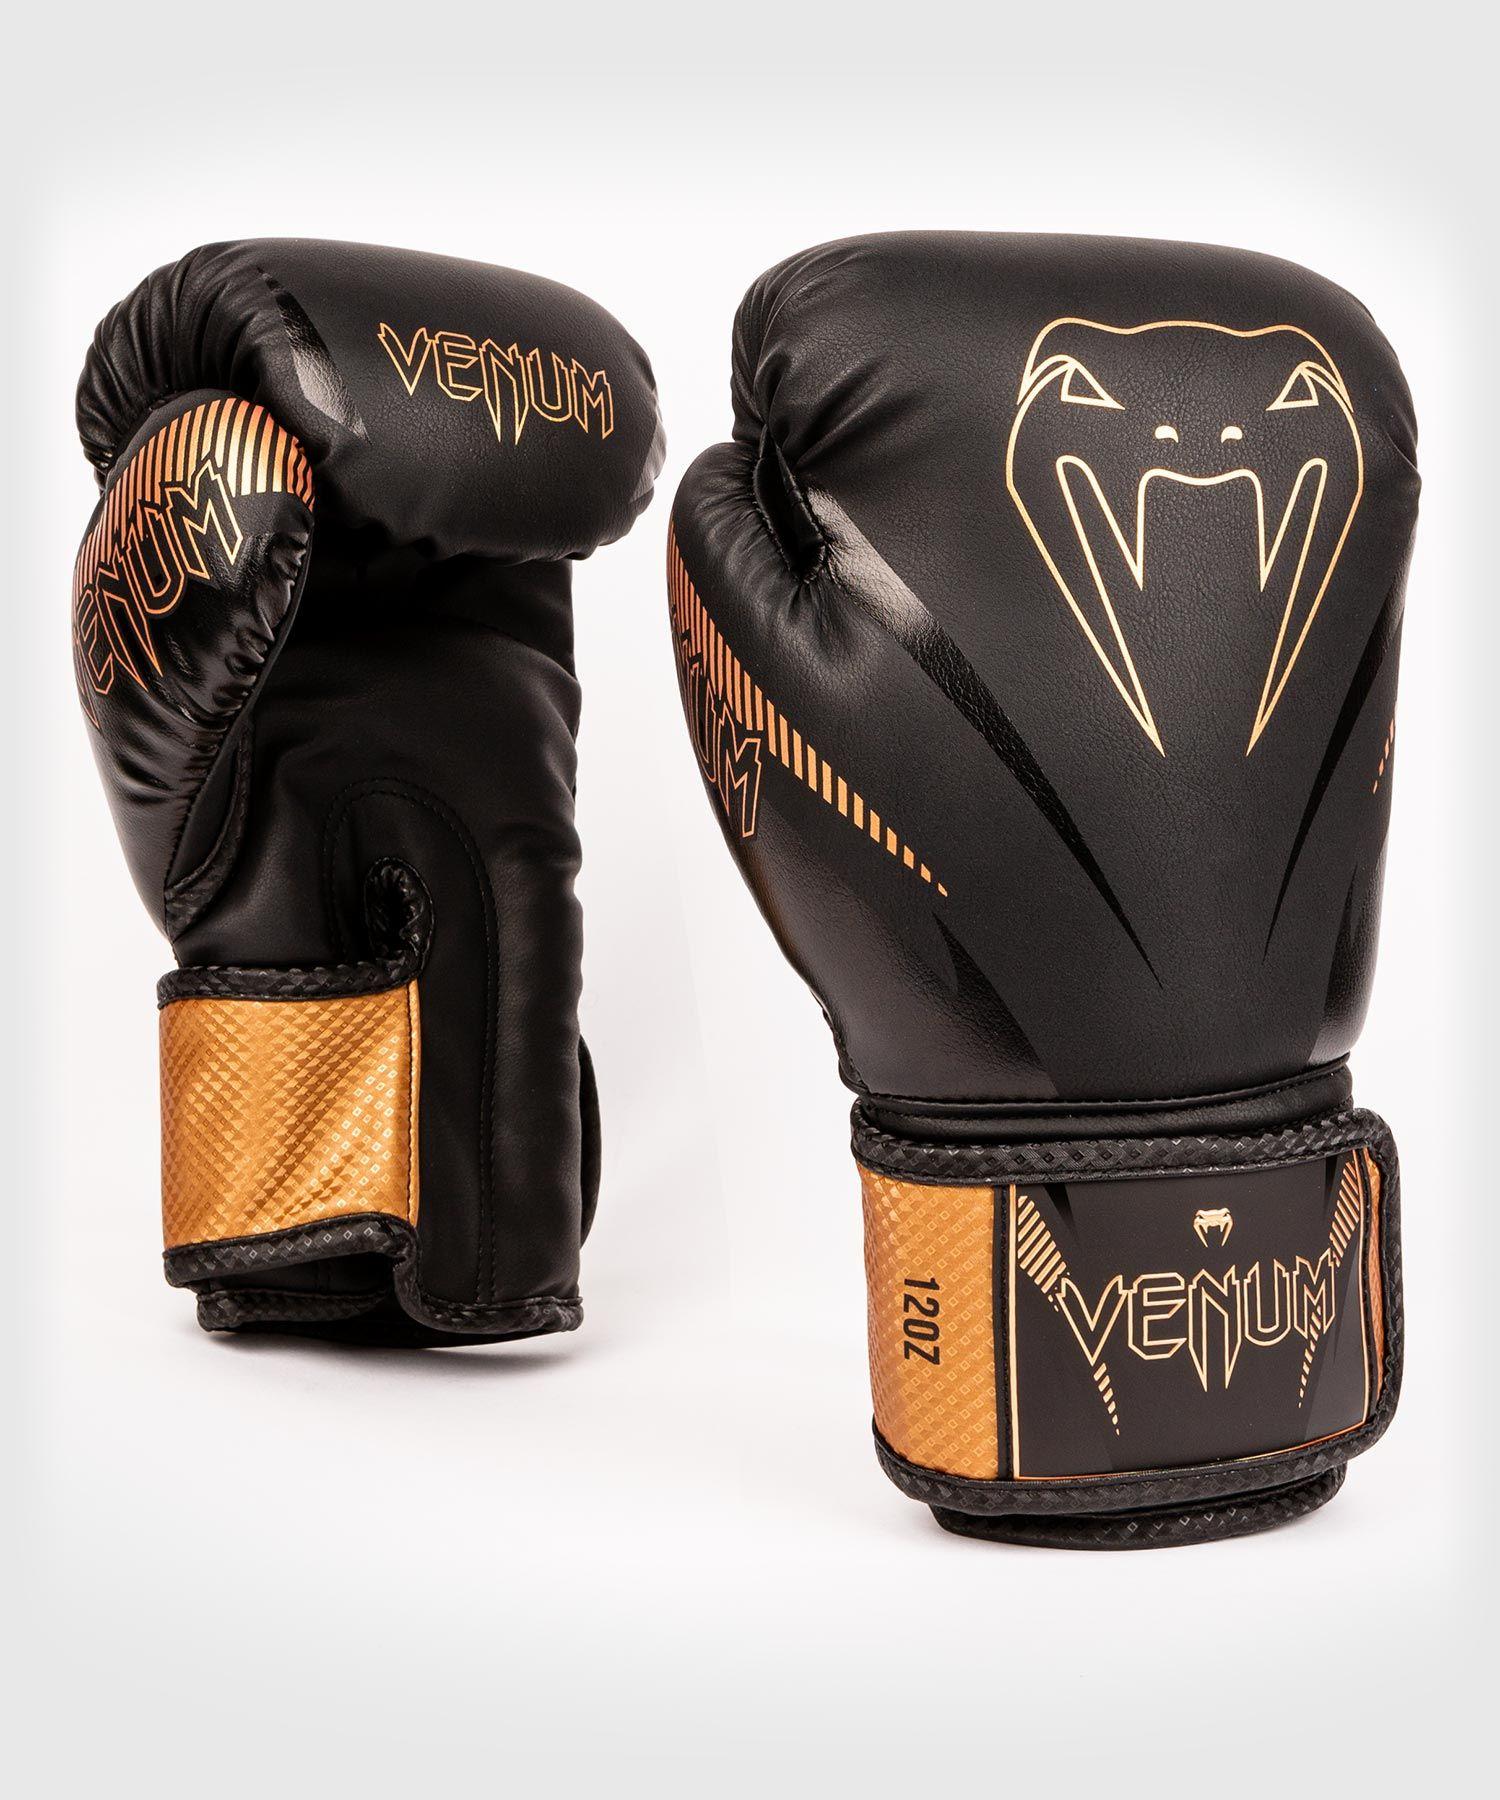 Venum Impact Boxing Gloves - Black/Bronze